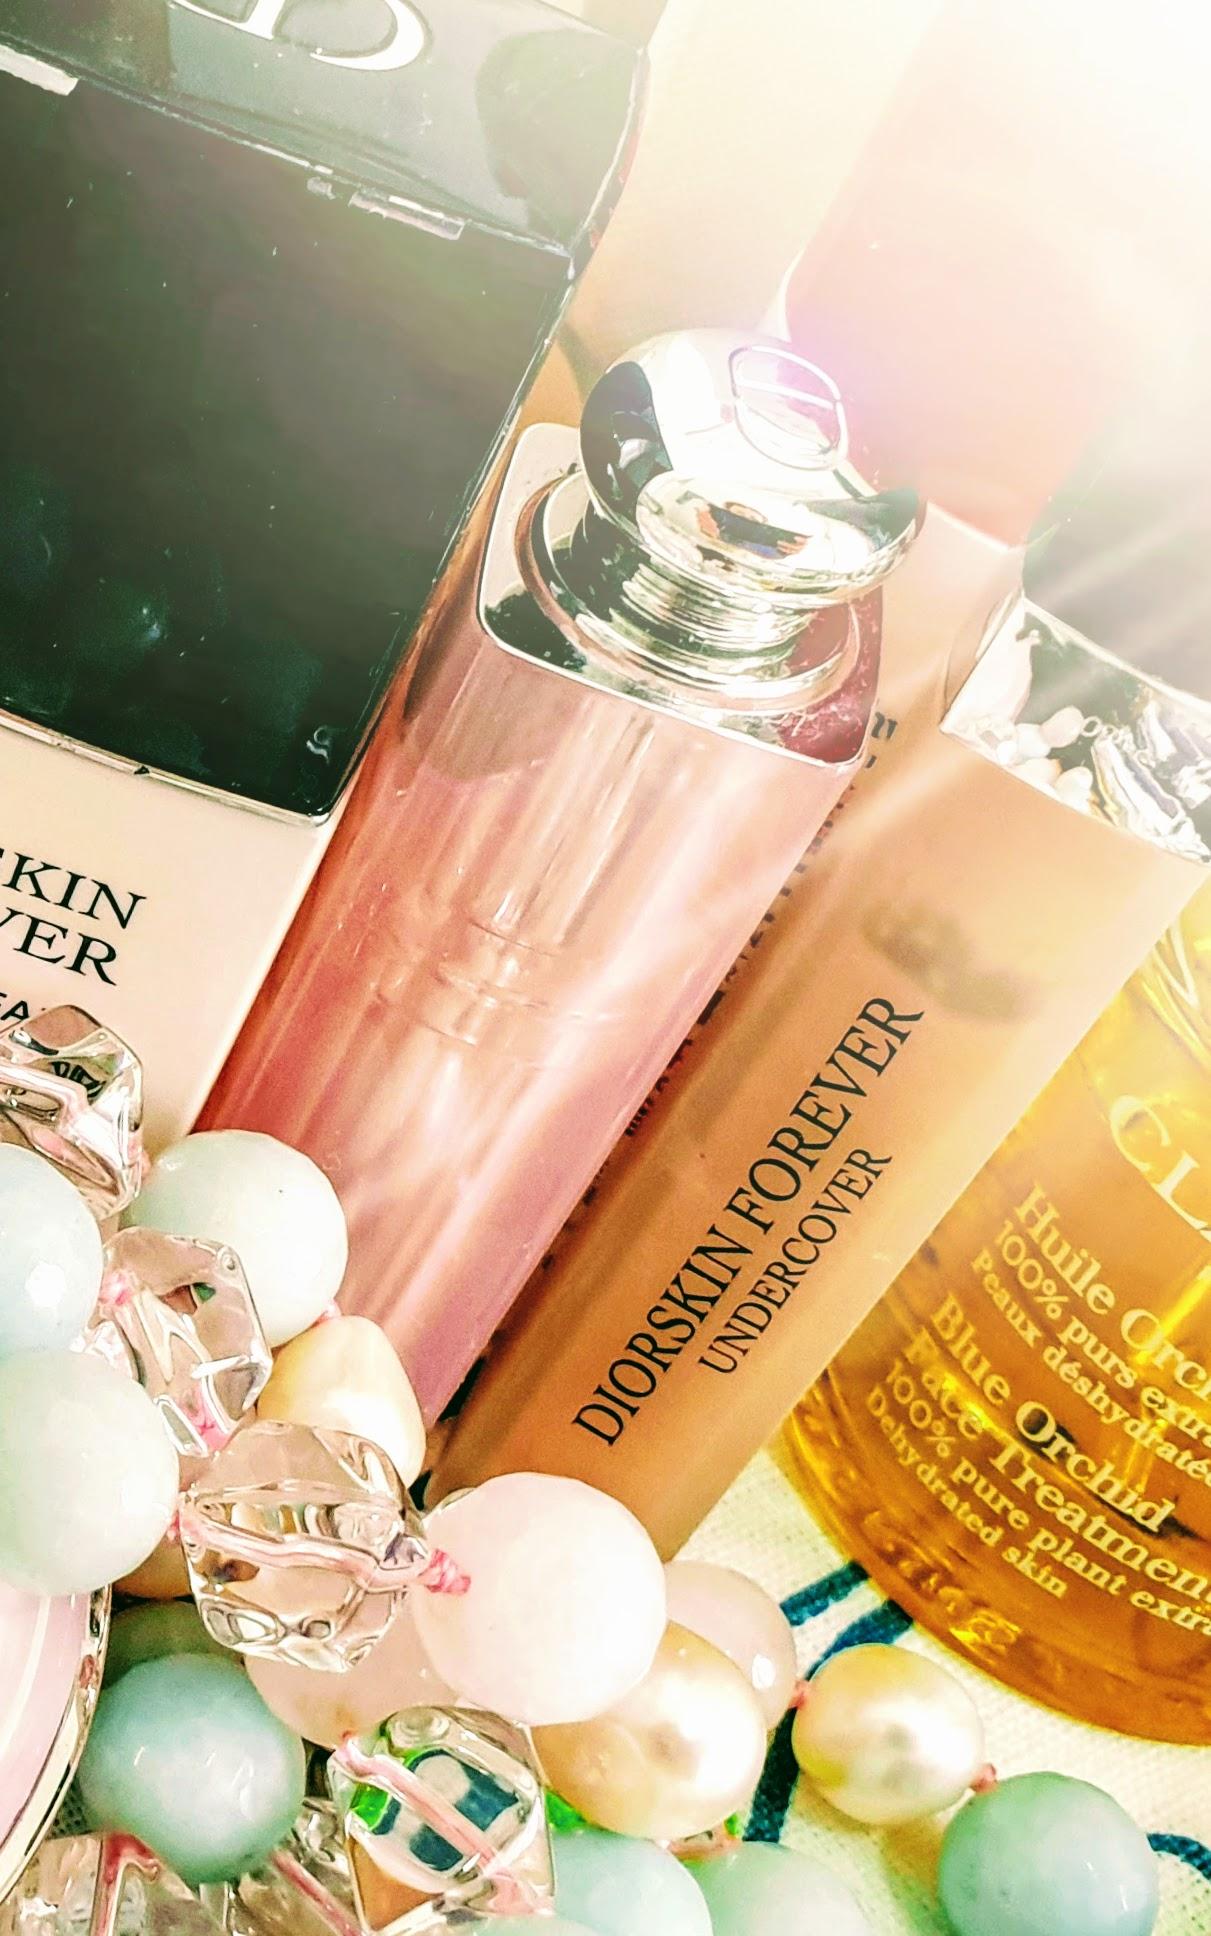 kosmetiikan suosikk0ilistani Dior Undercover